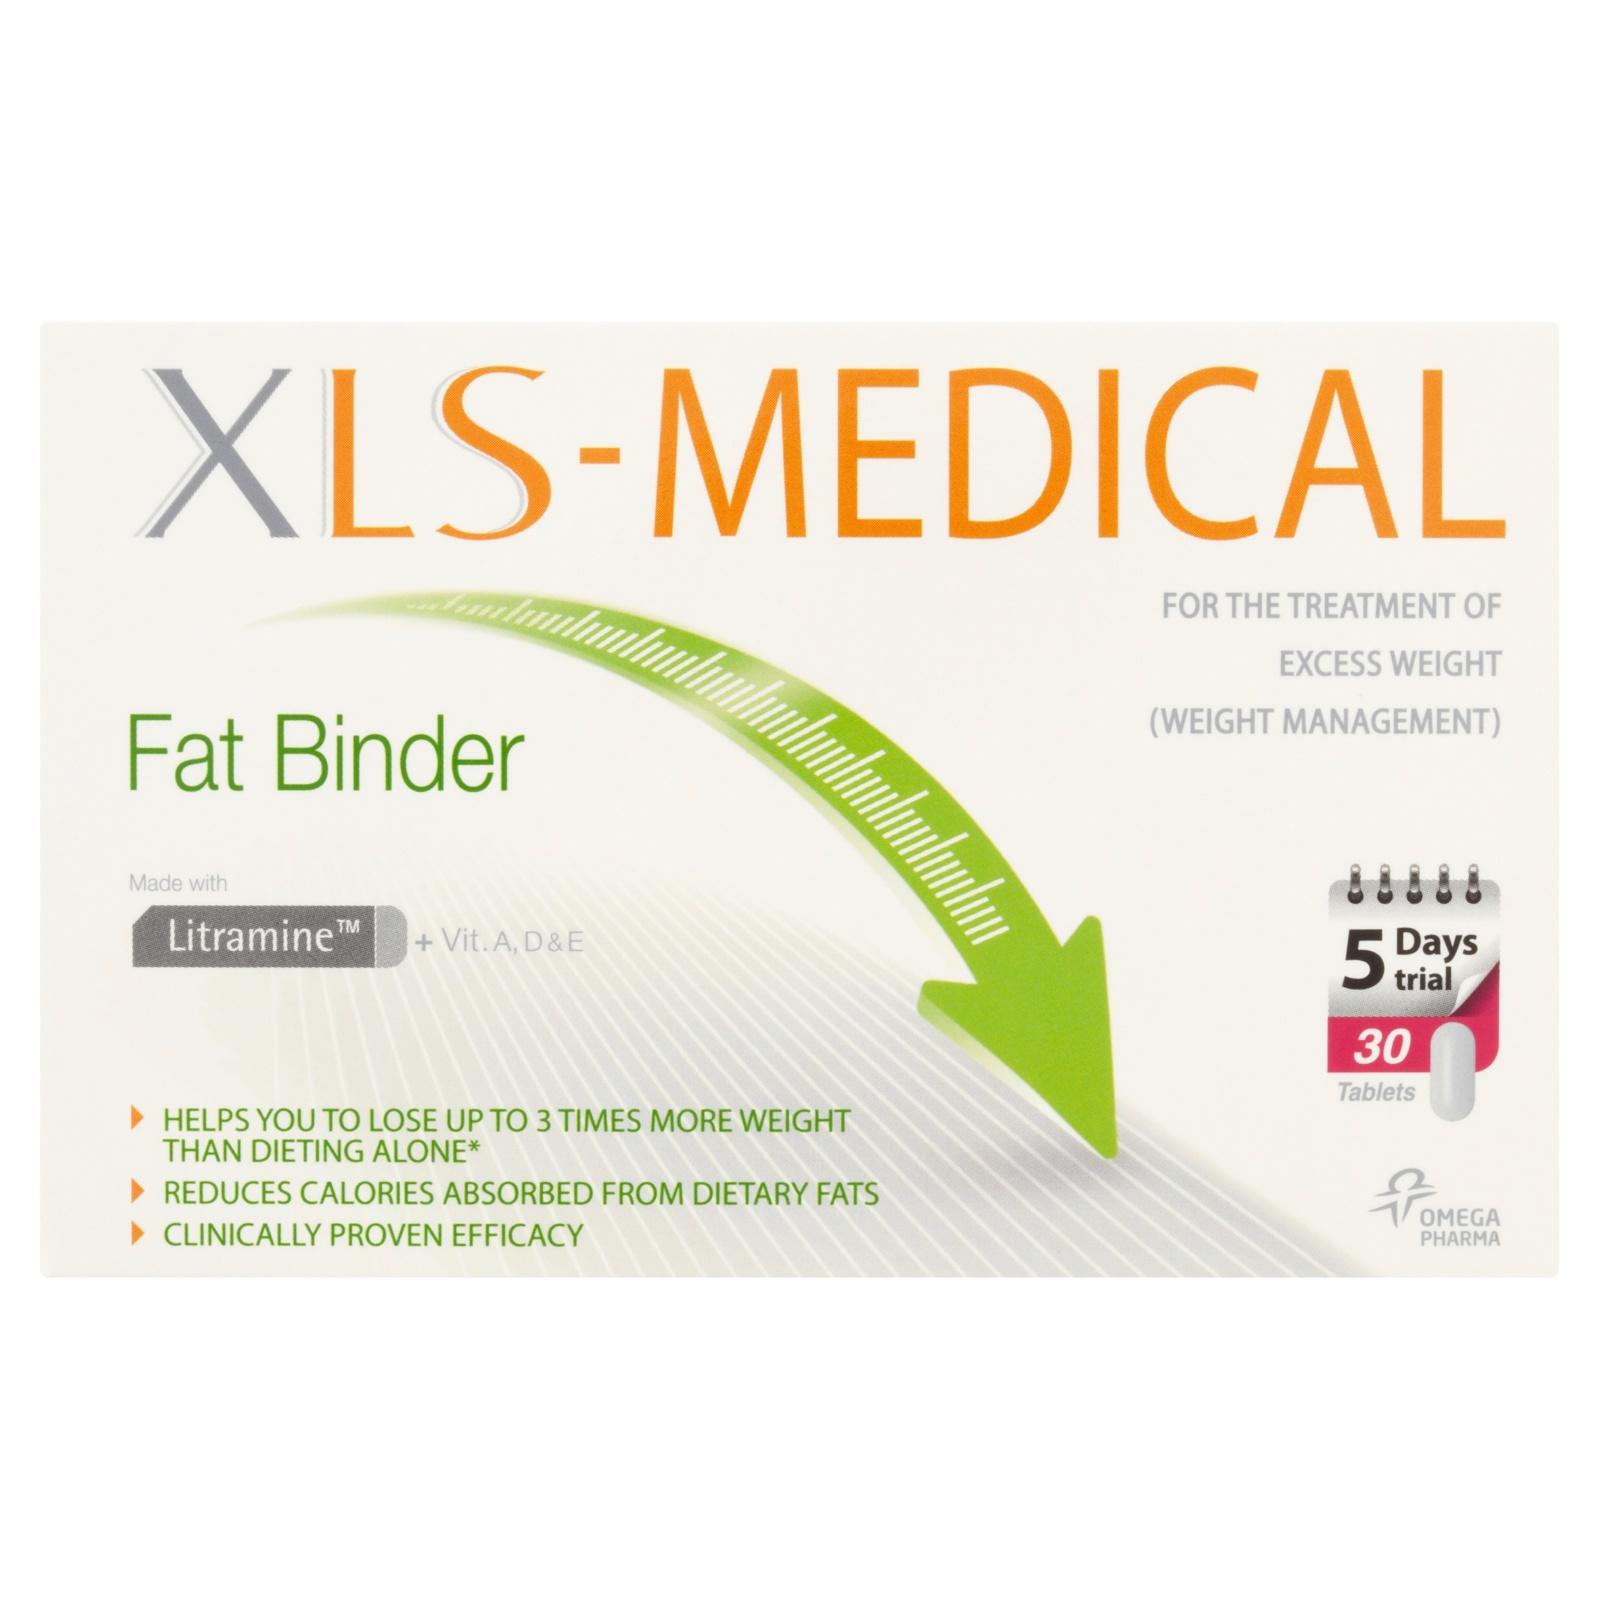 Xls Medical Fat Binder 5 Days Trial Pack 30 Tablets